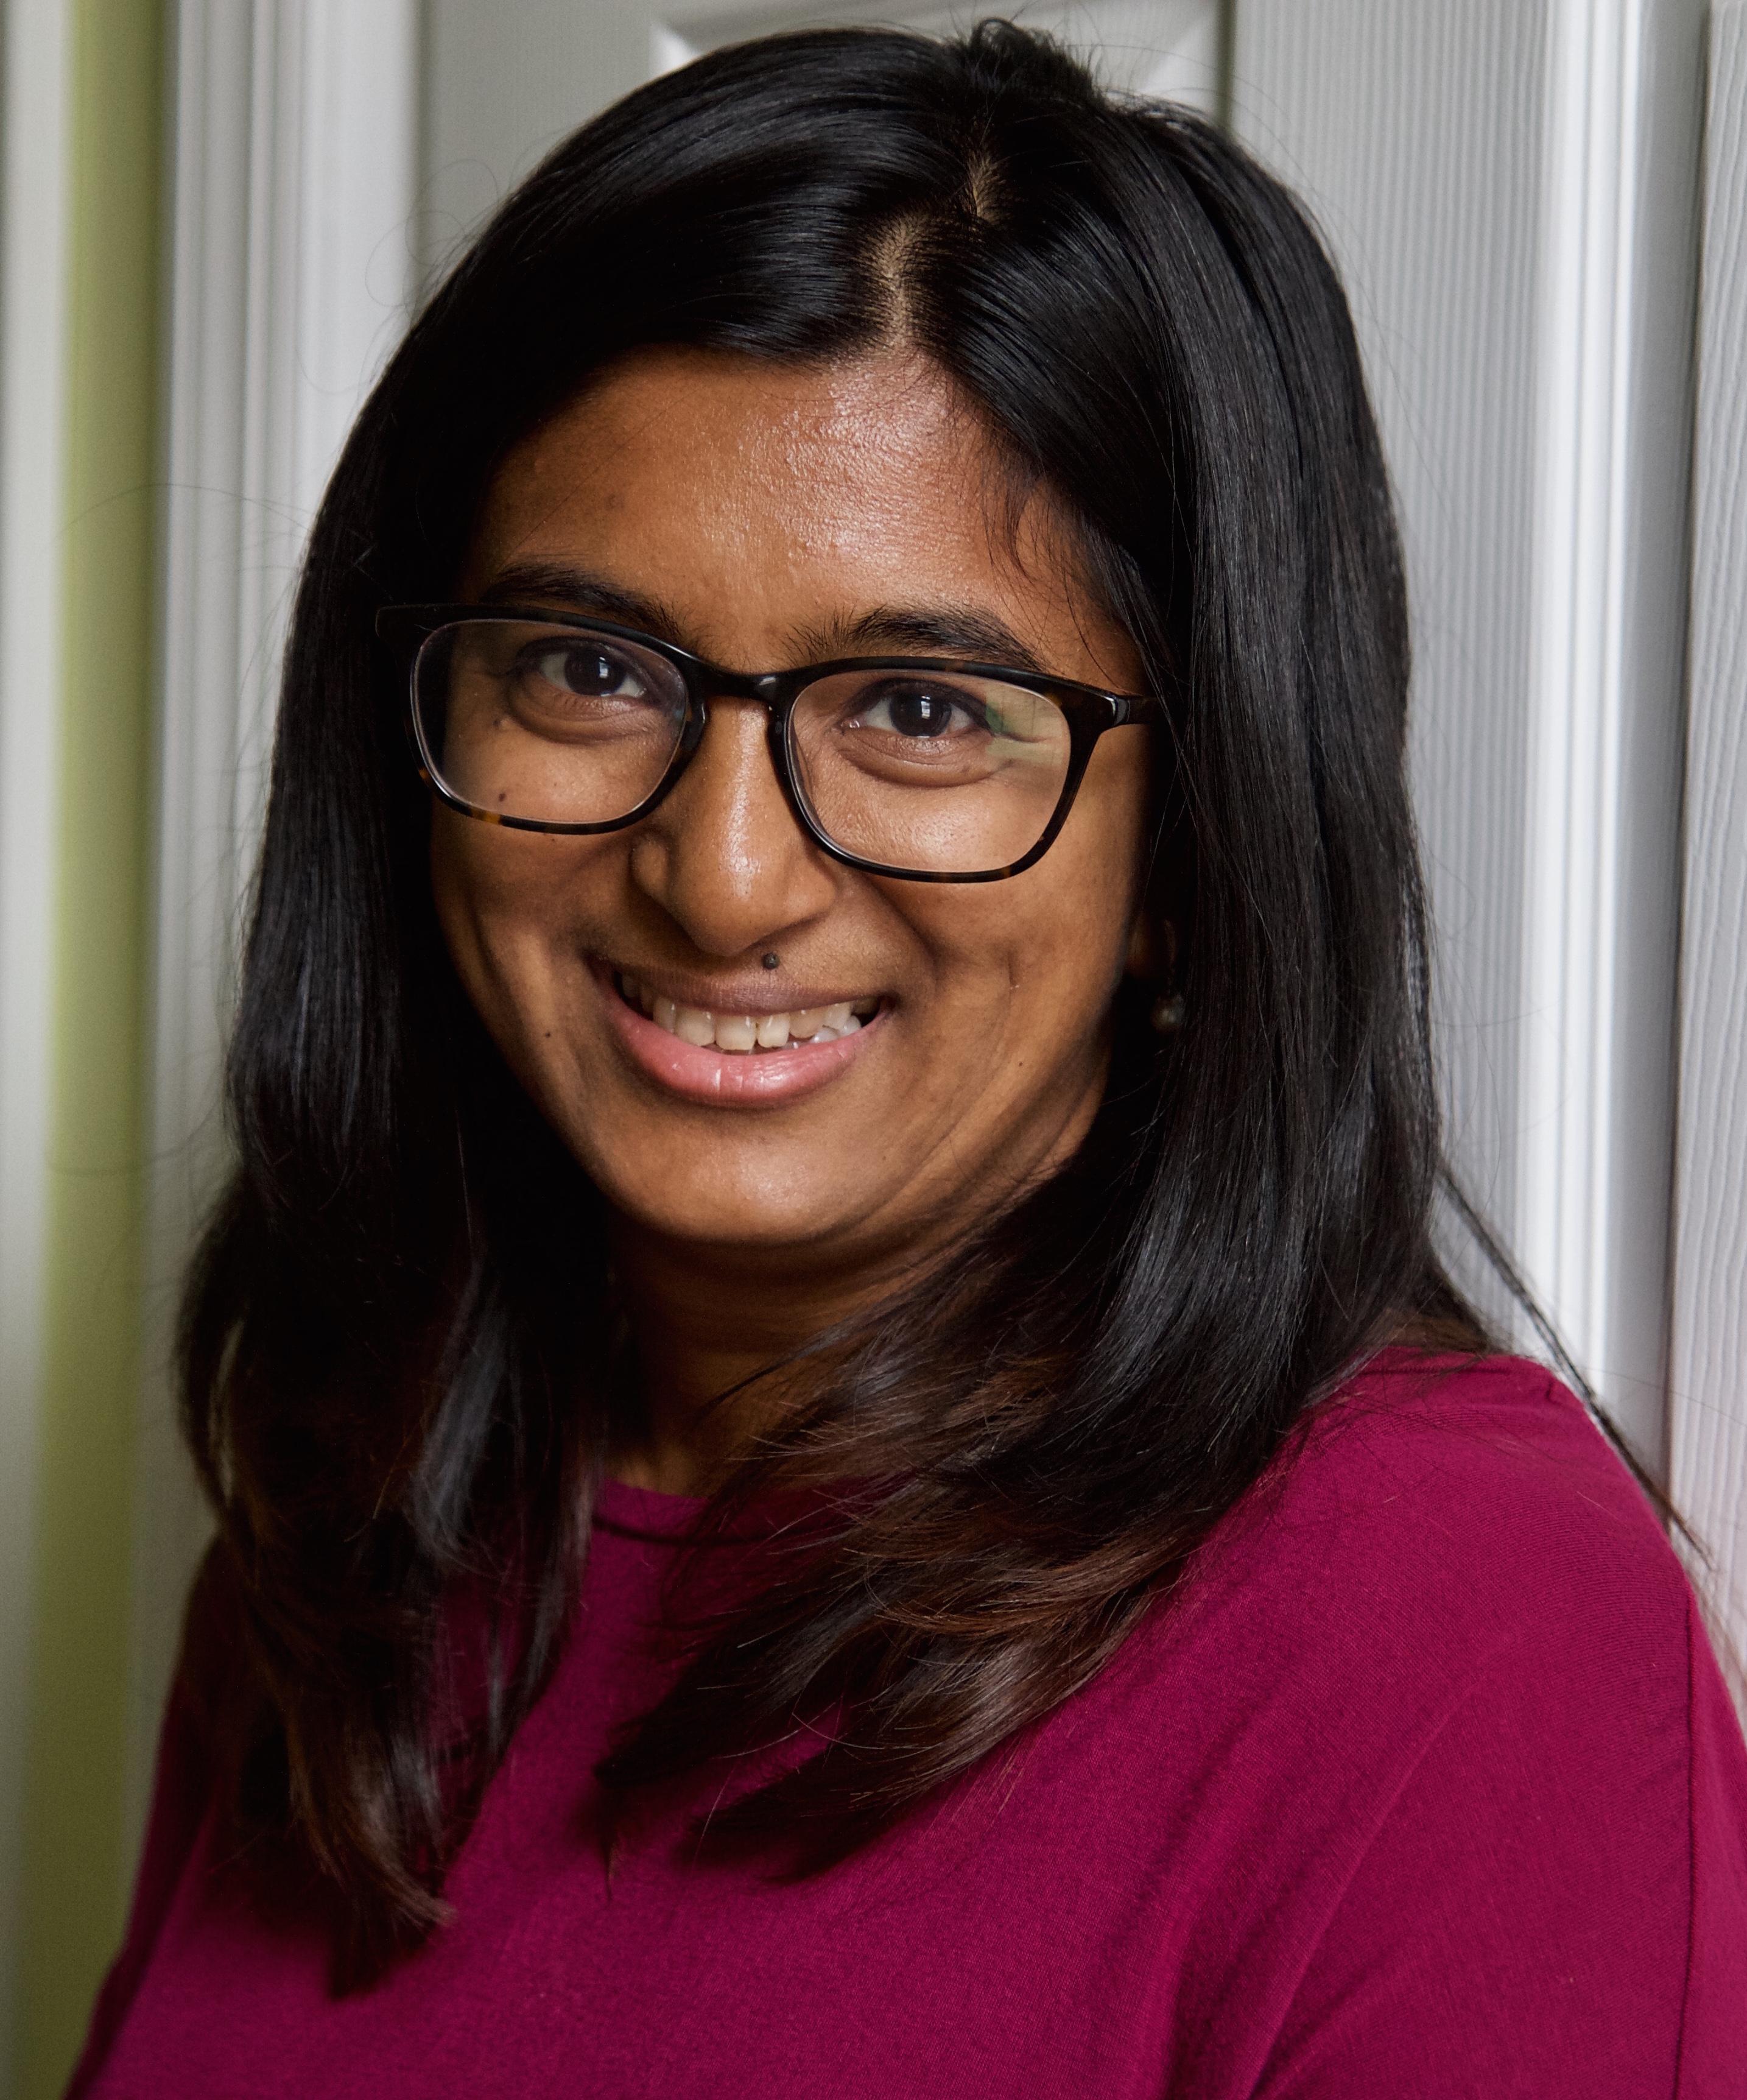 Headshot of Luna Ranjit